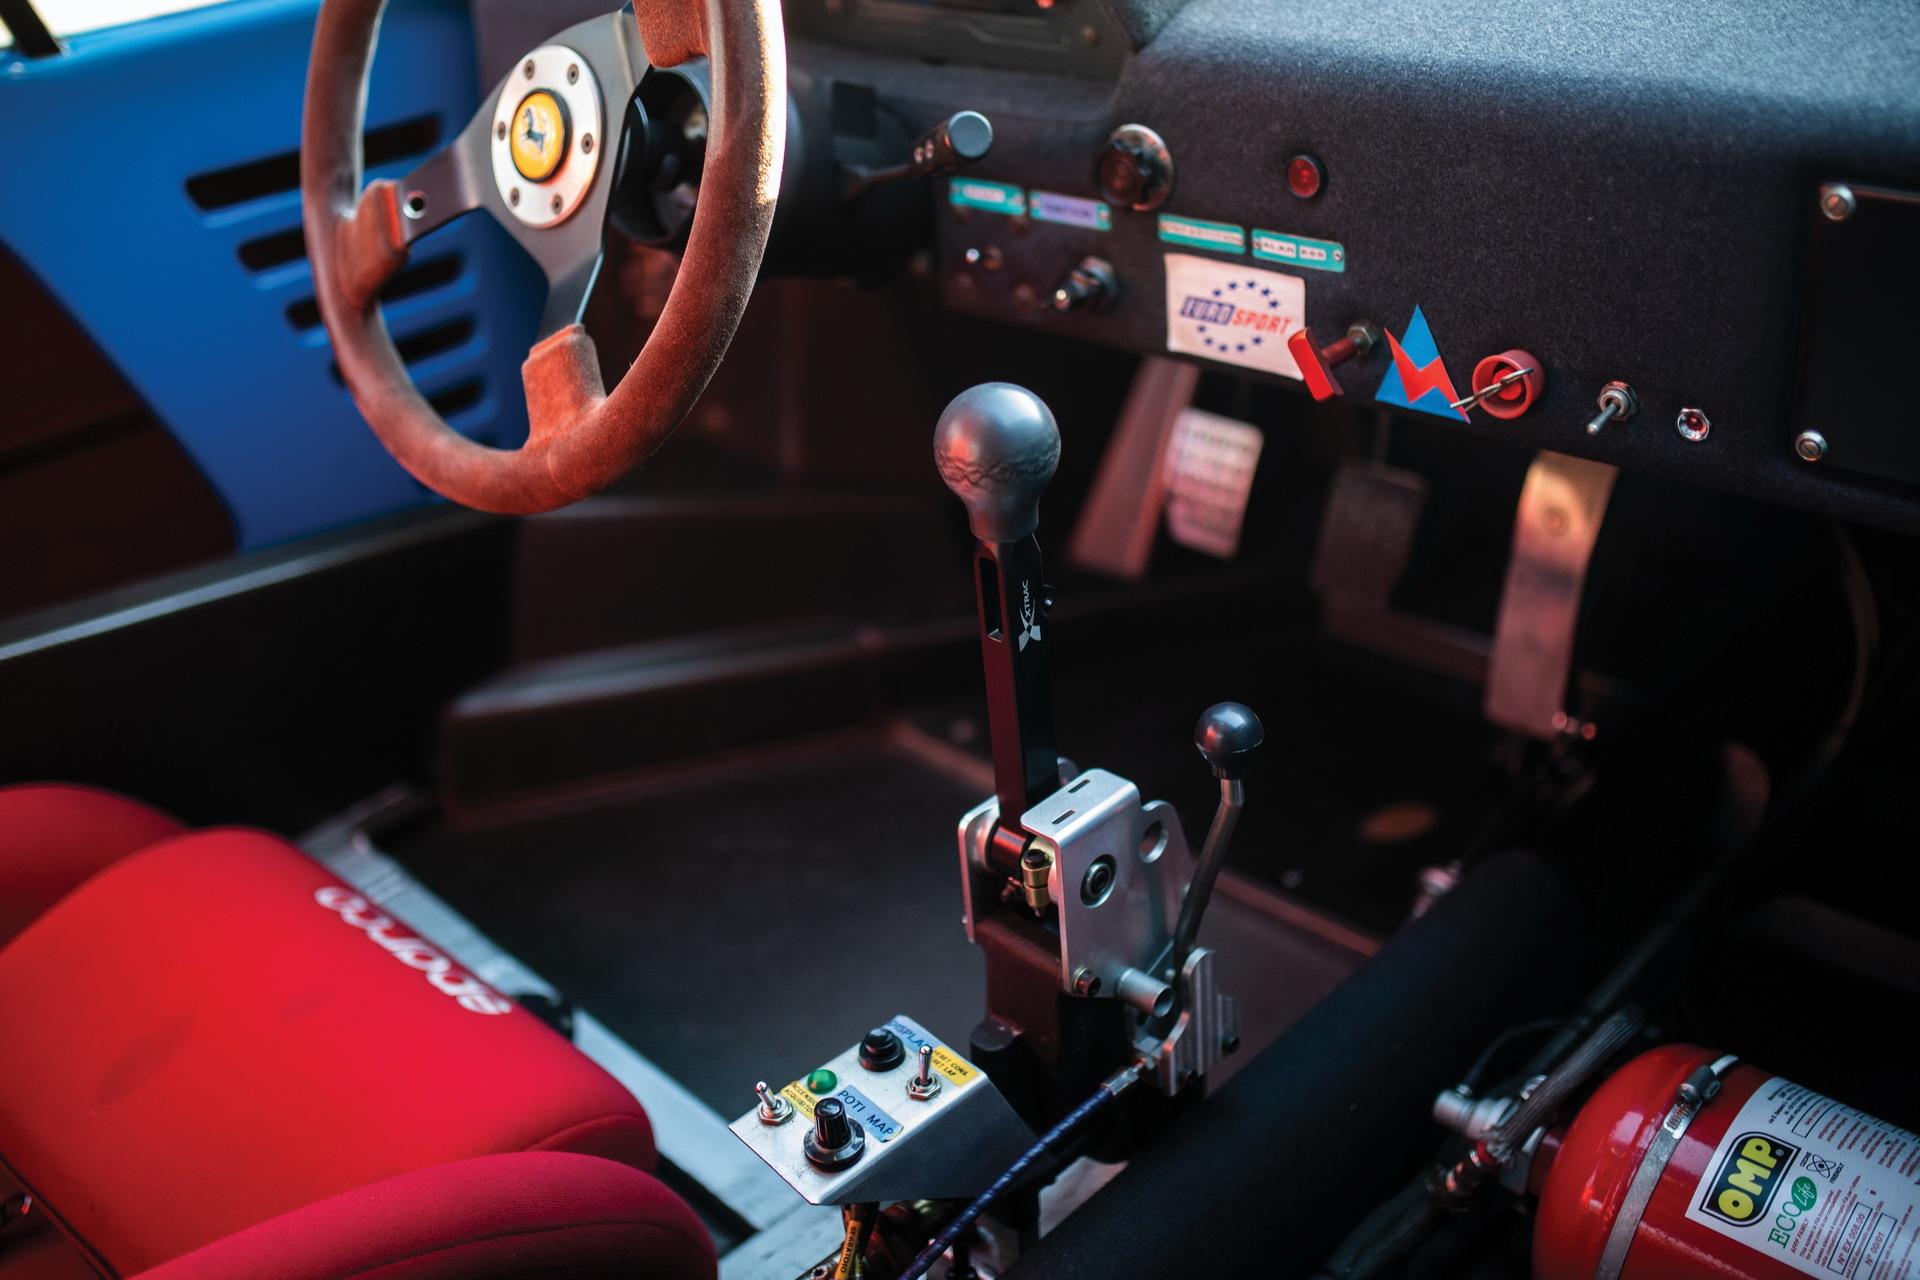 Sắp đấu giá chiếc xe đua Ferrari 6 triệu USD